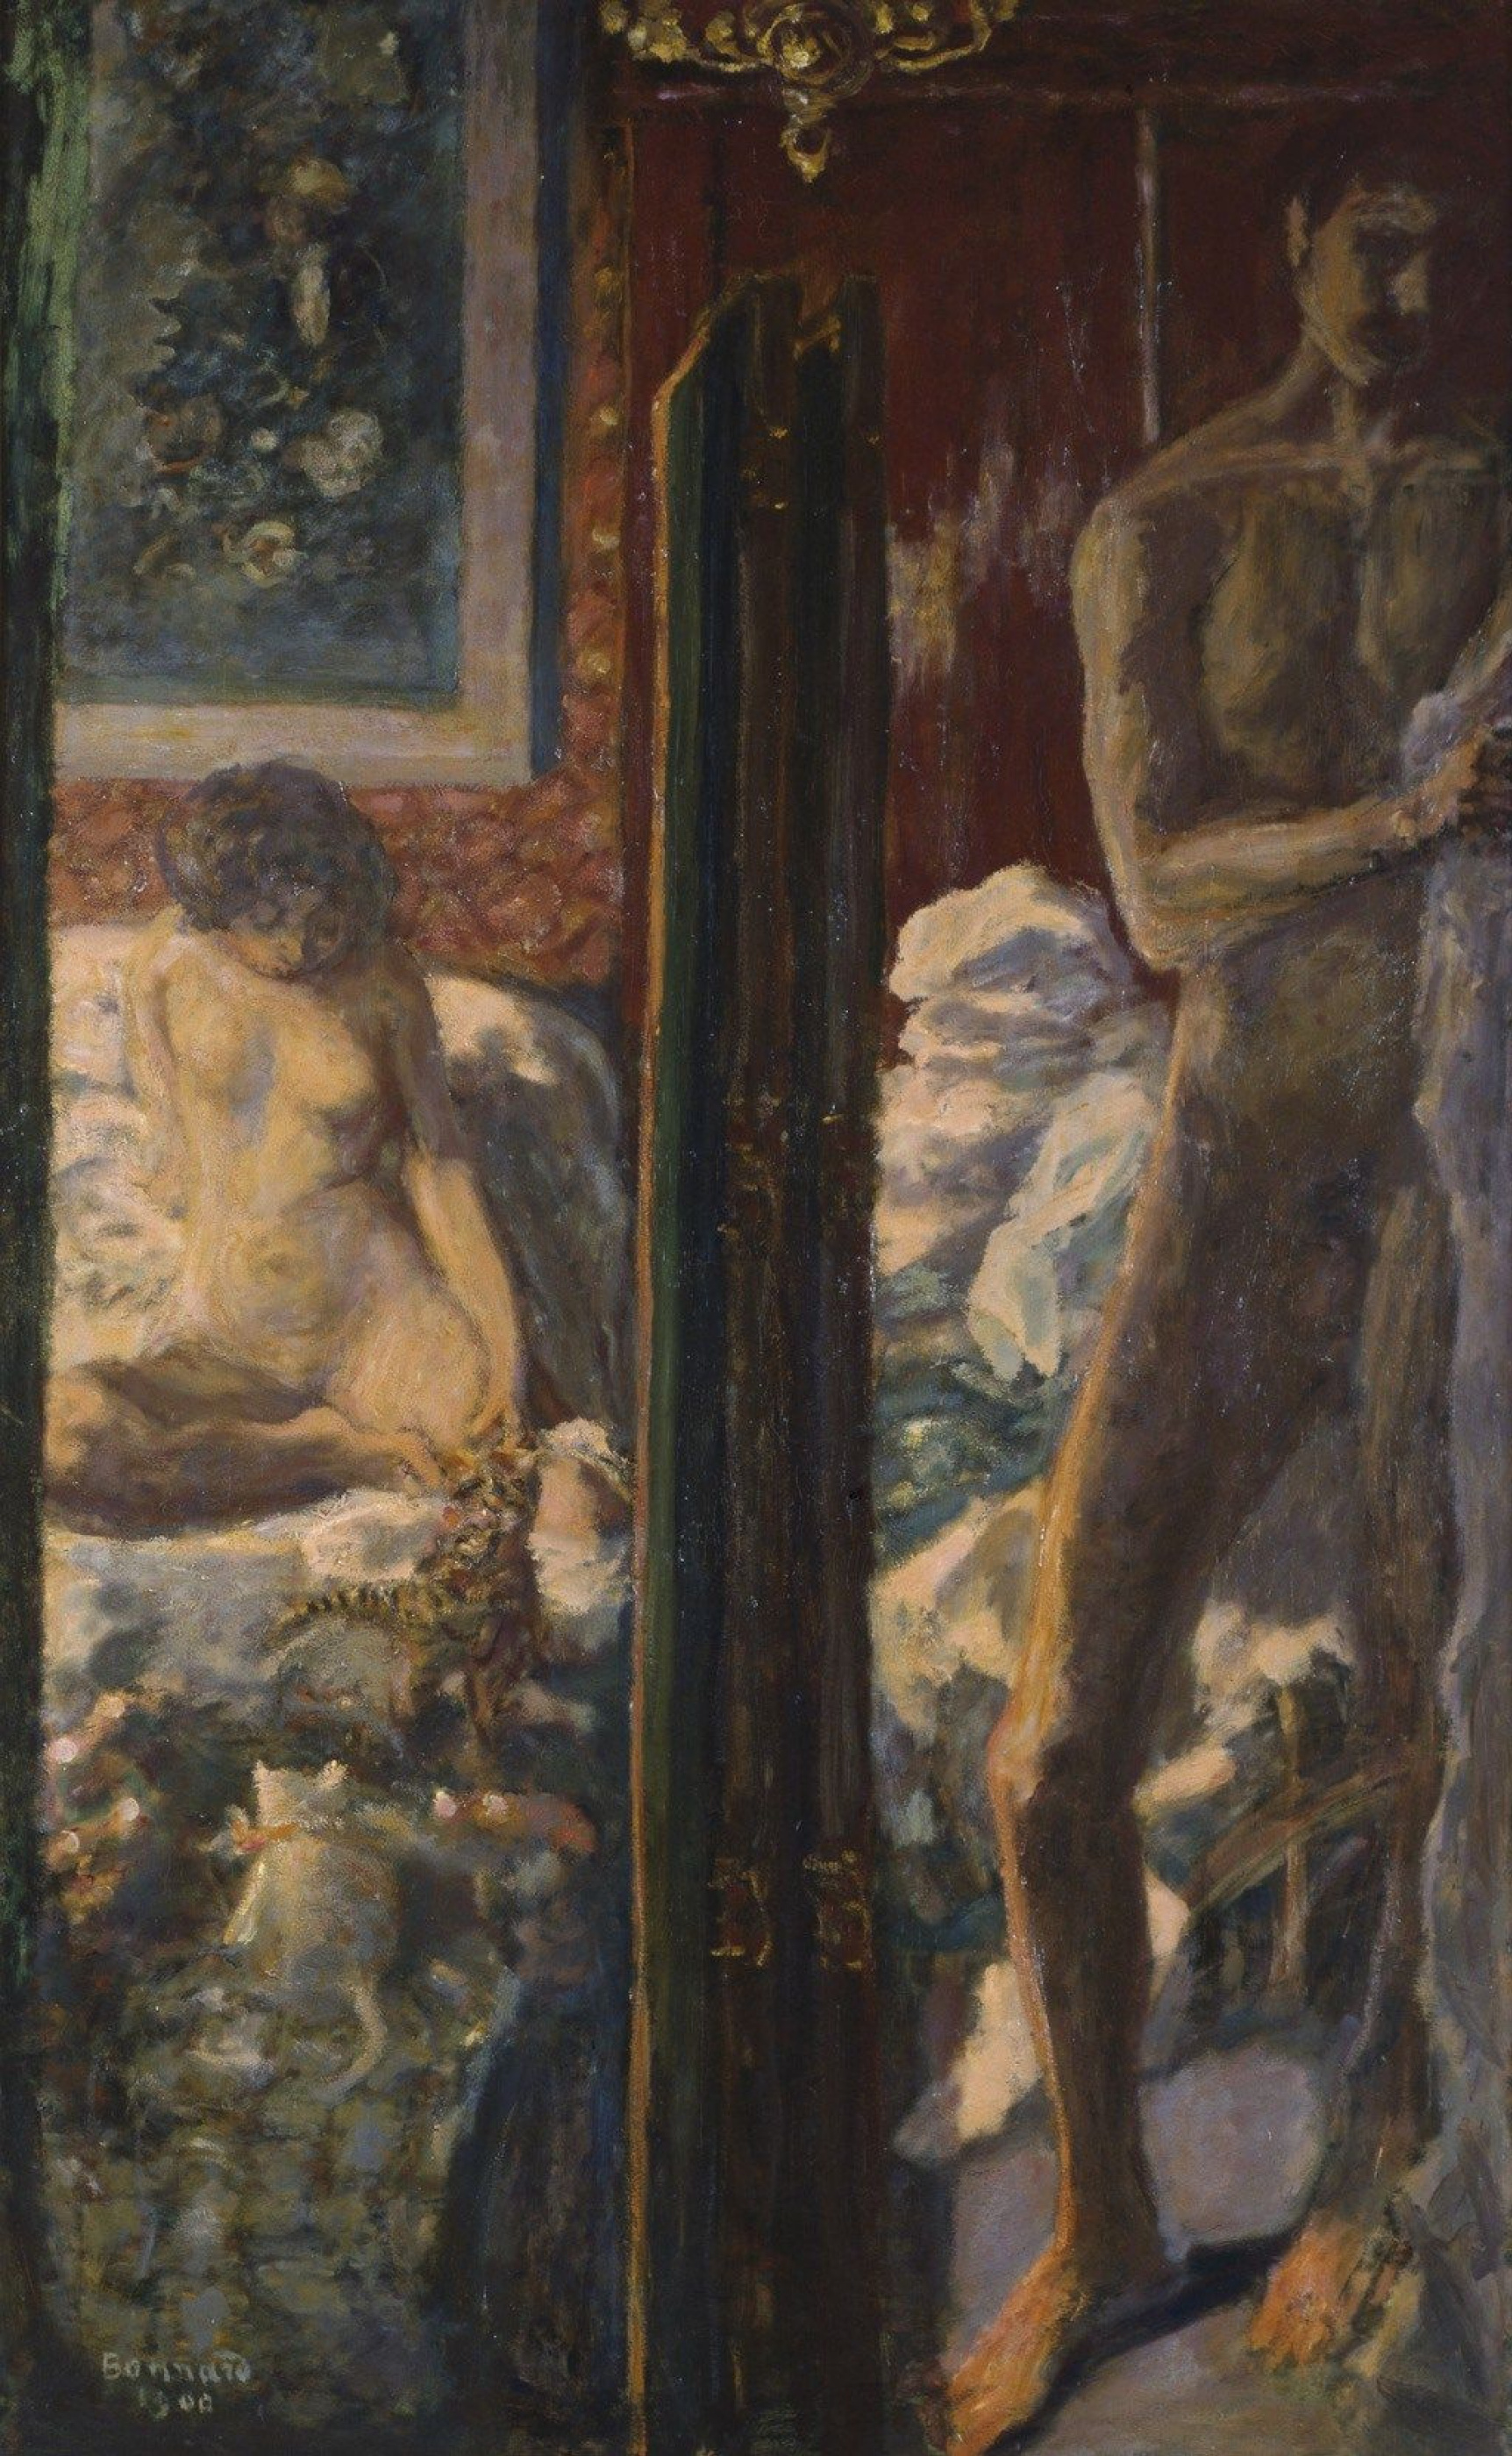 Пьер Боннар. Мужчина и женщина